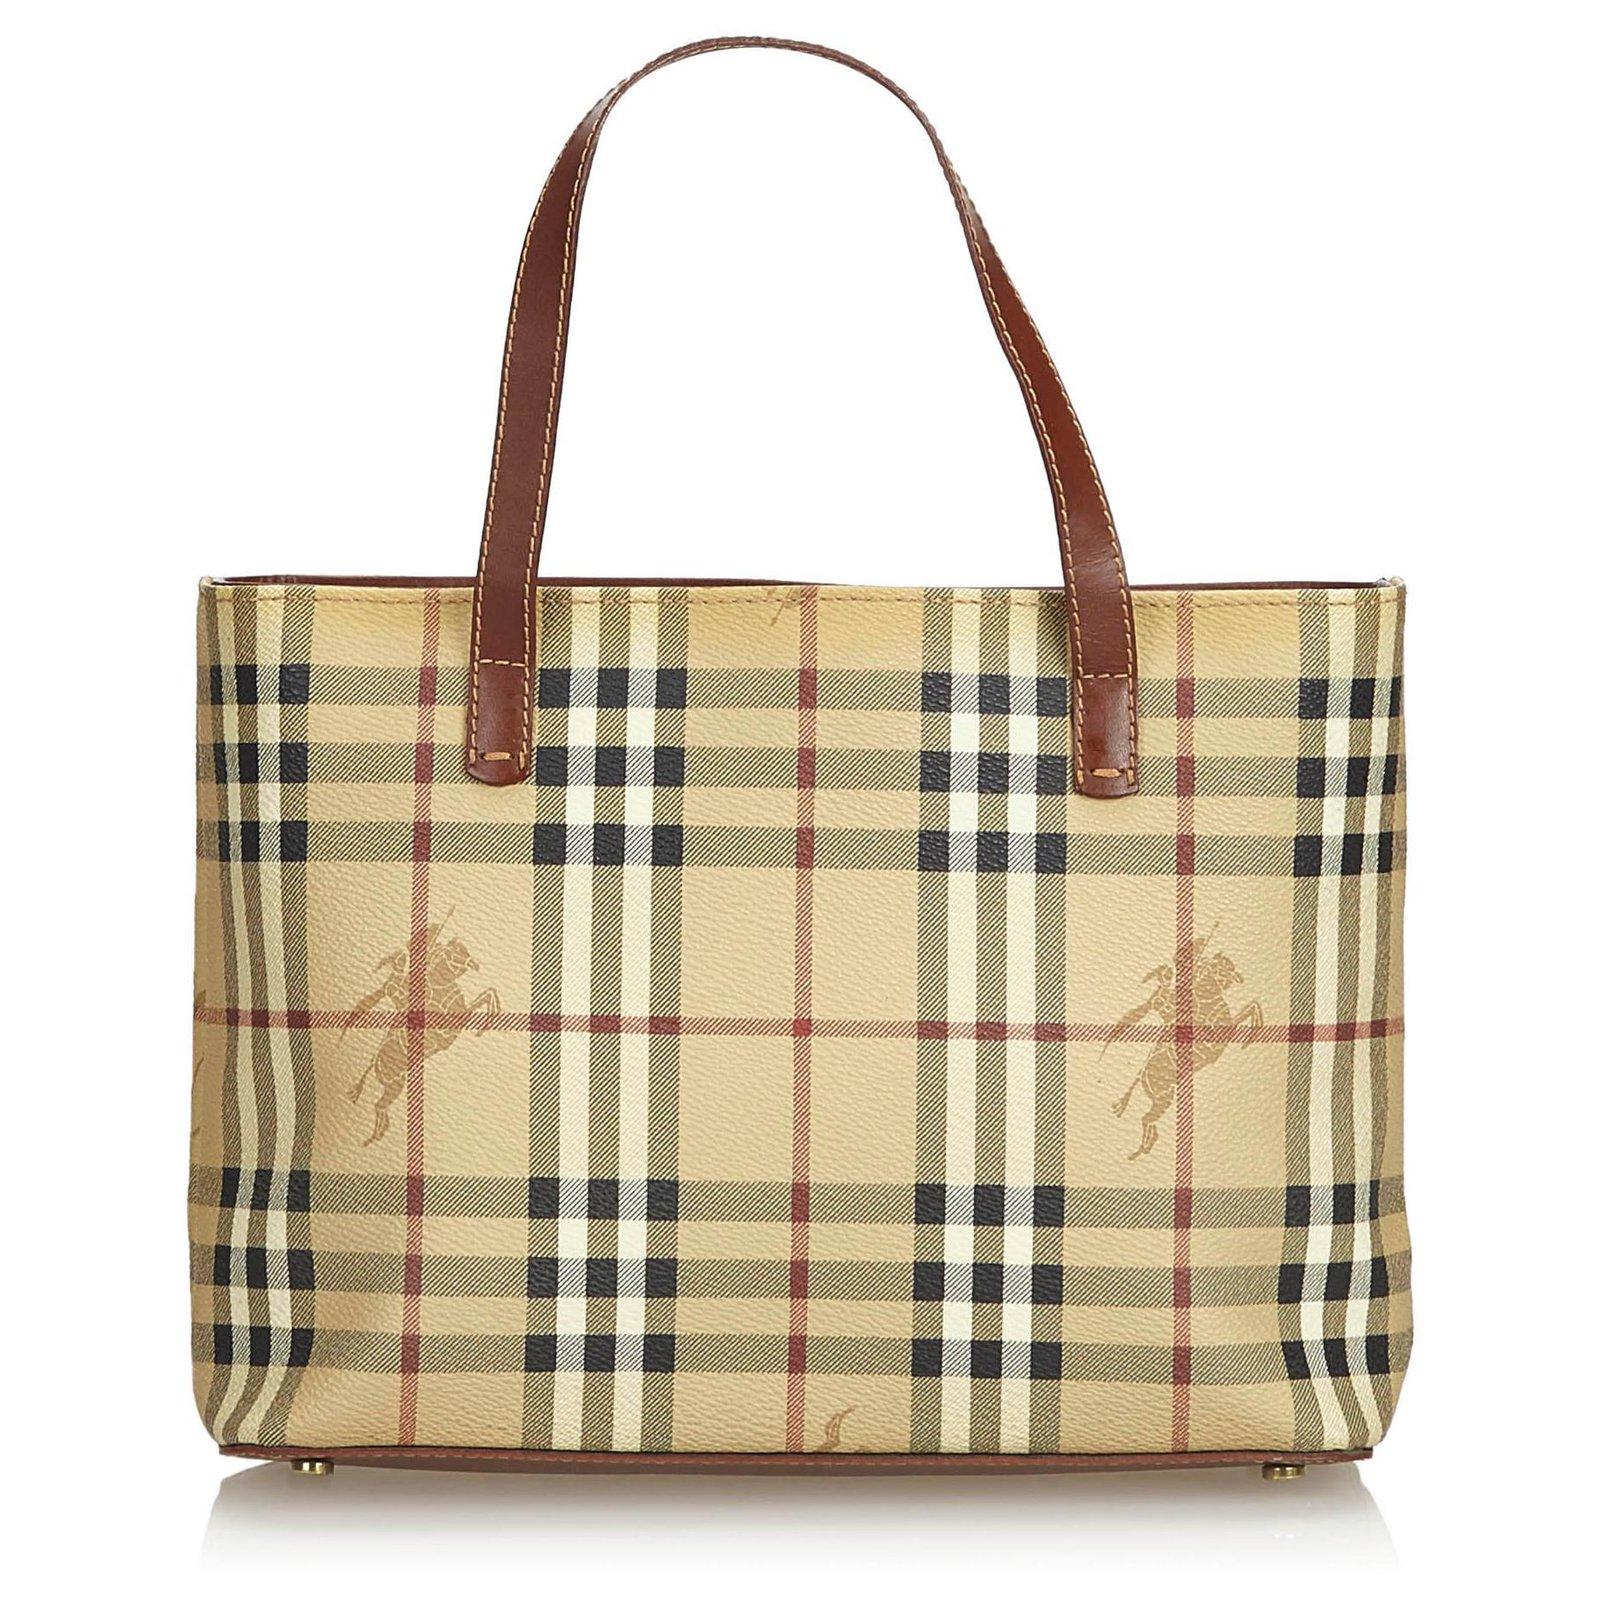 0e2f2e98f Burberry Burberry Brown Haymarket Check Coated Canvas Handbag Handbags  Leather,Other,Cloth,Cloth